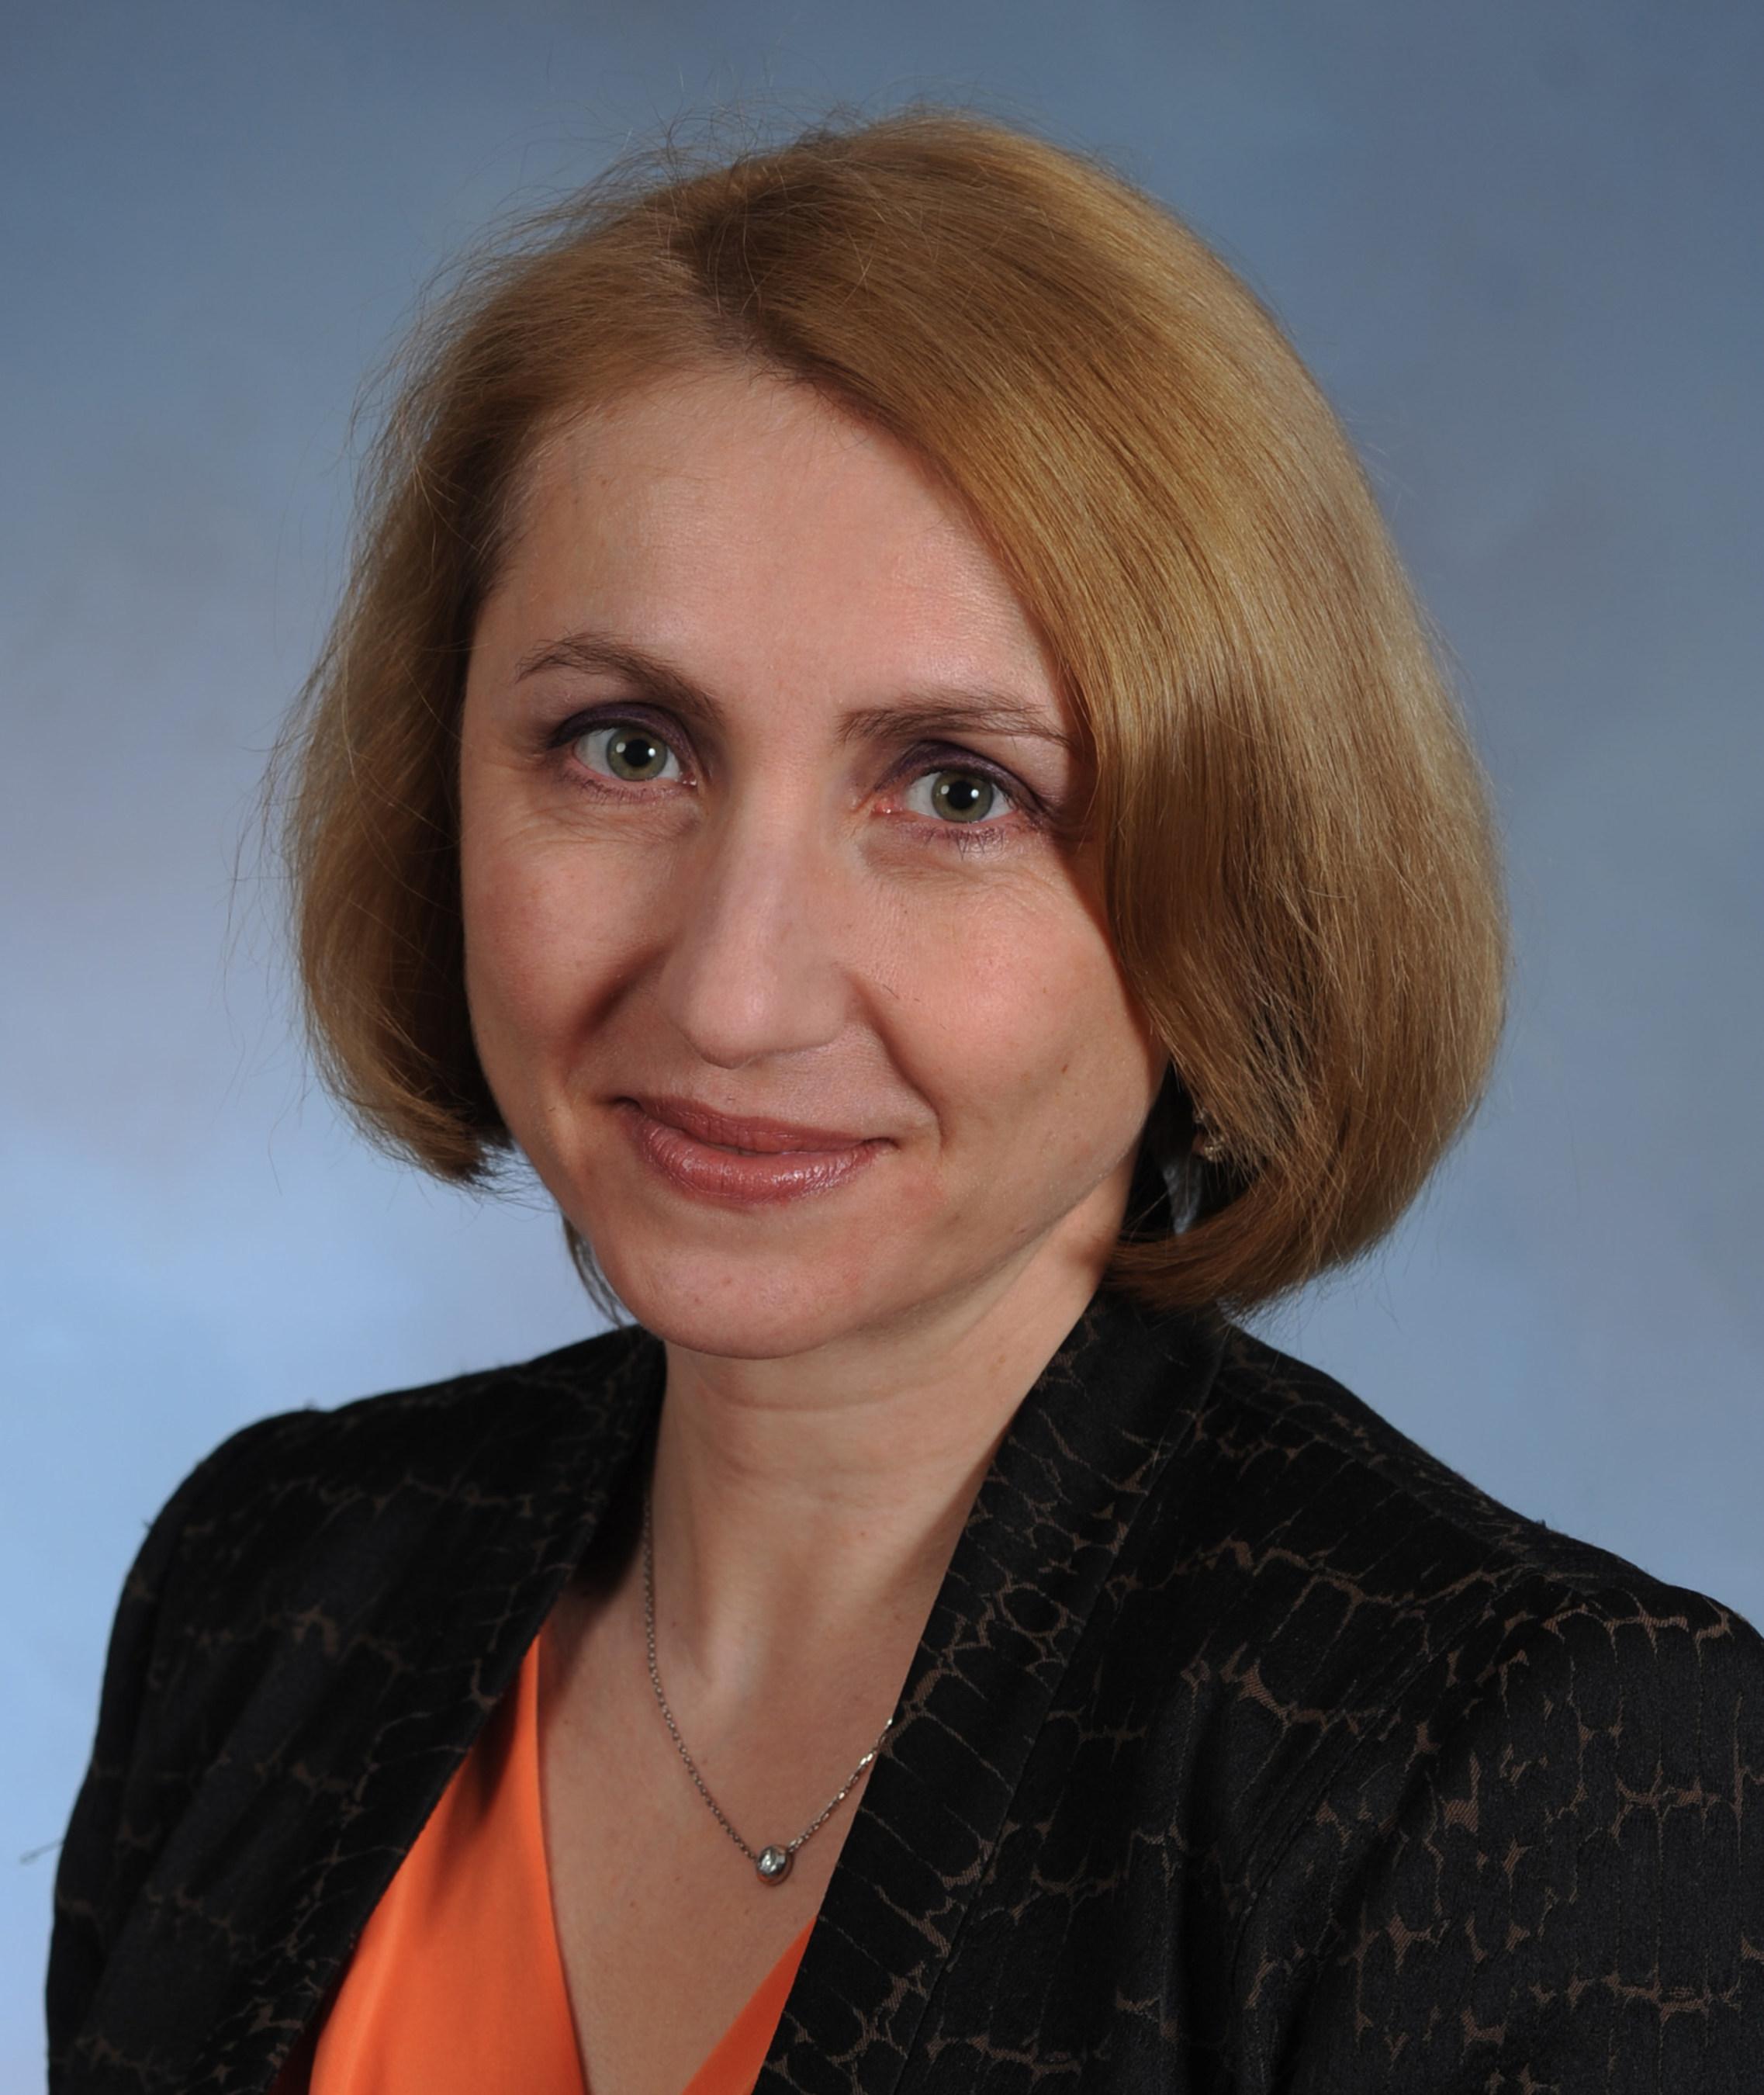 Inna Kuznetsova ist zur President und Chief Operating Officer bei INTTRA befördert worden